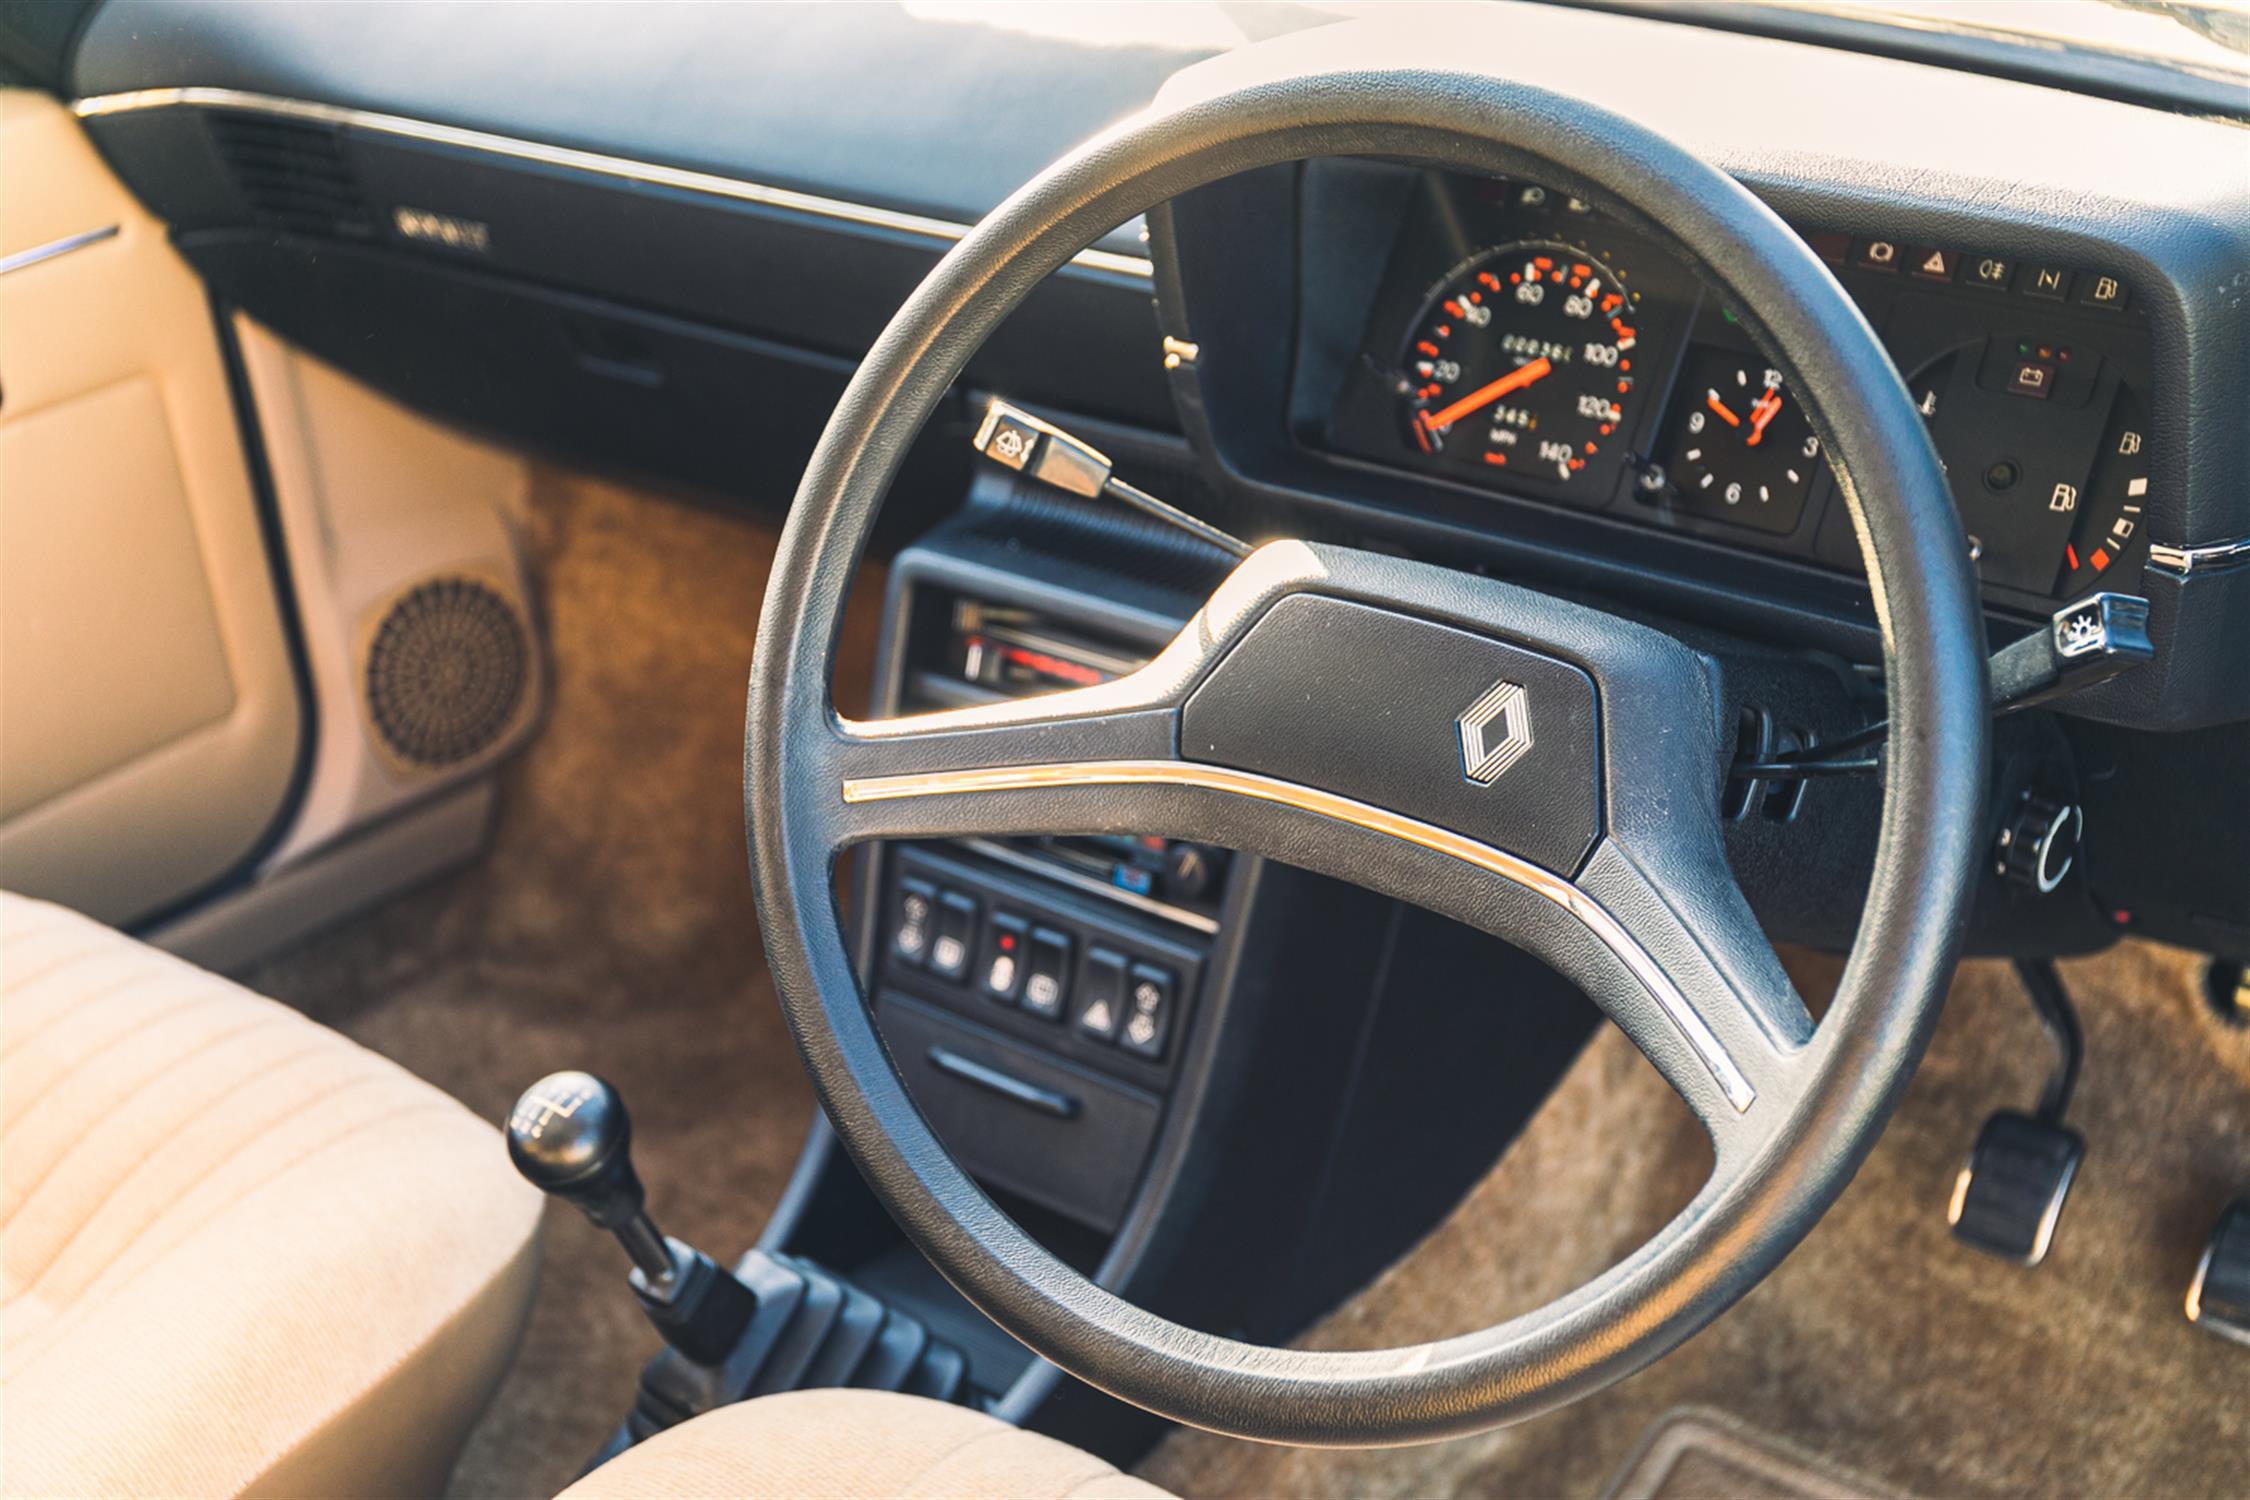 1983 Renault 18 GTL Estate - Image 29 of 32